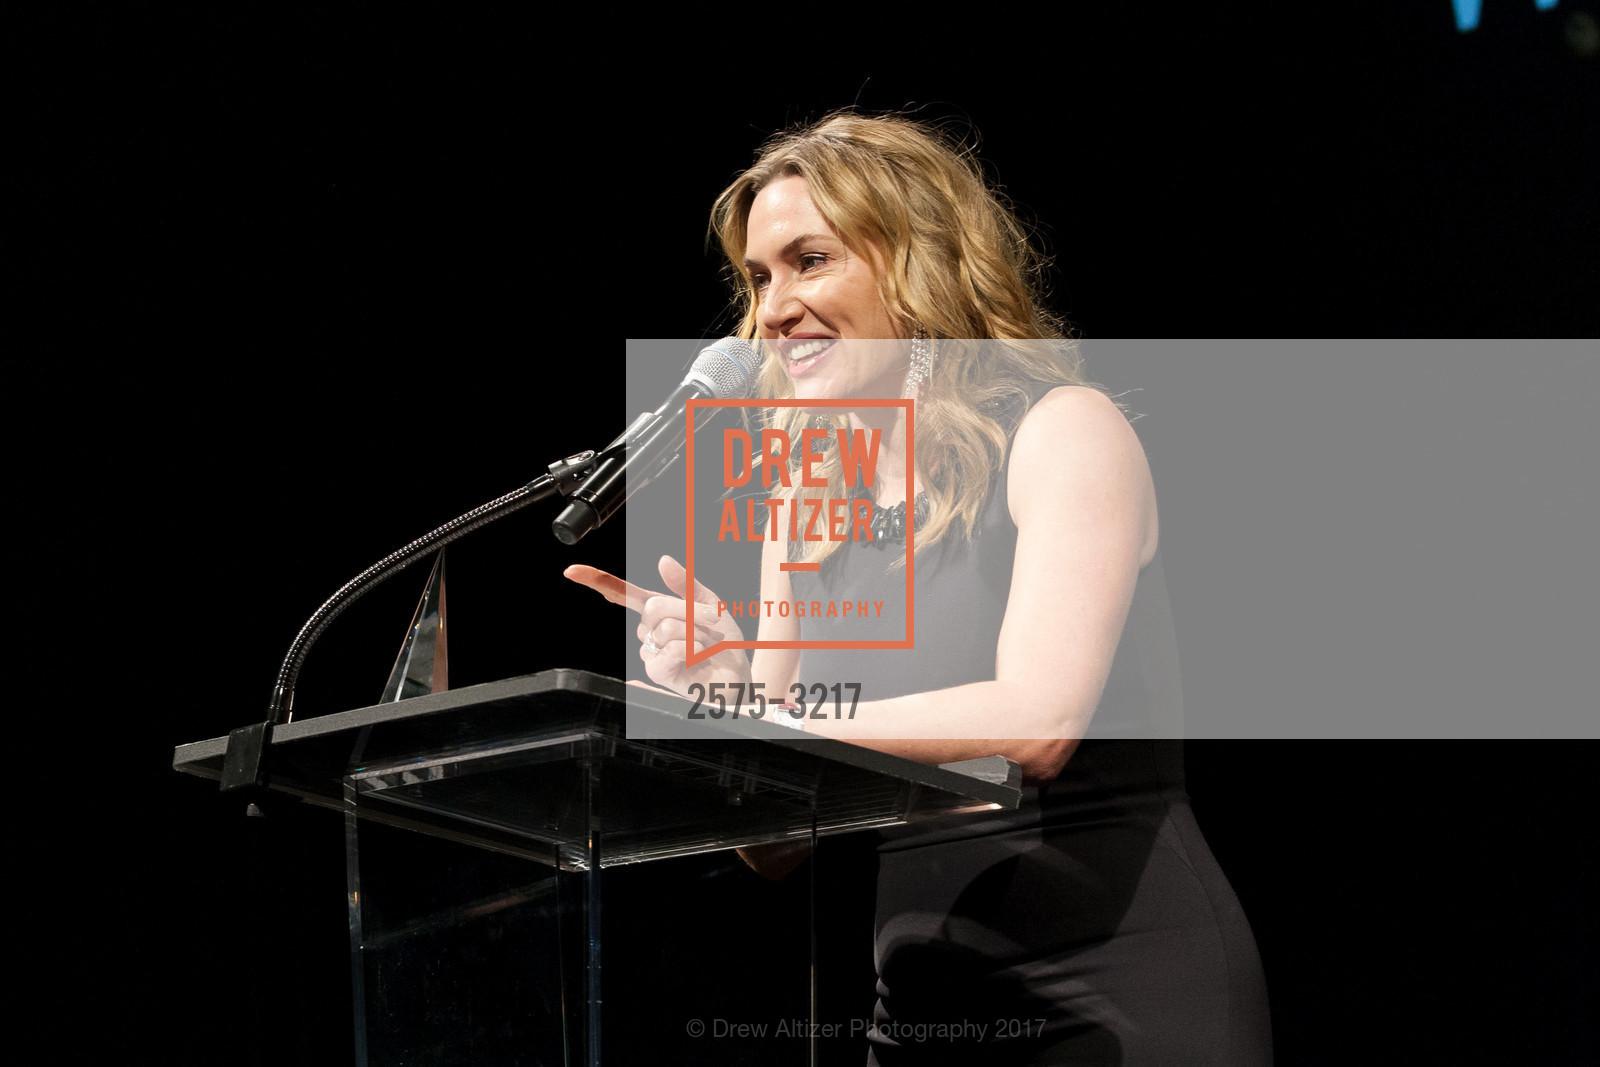 Kate Winslet, Photo #2575-3217